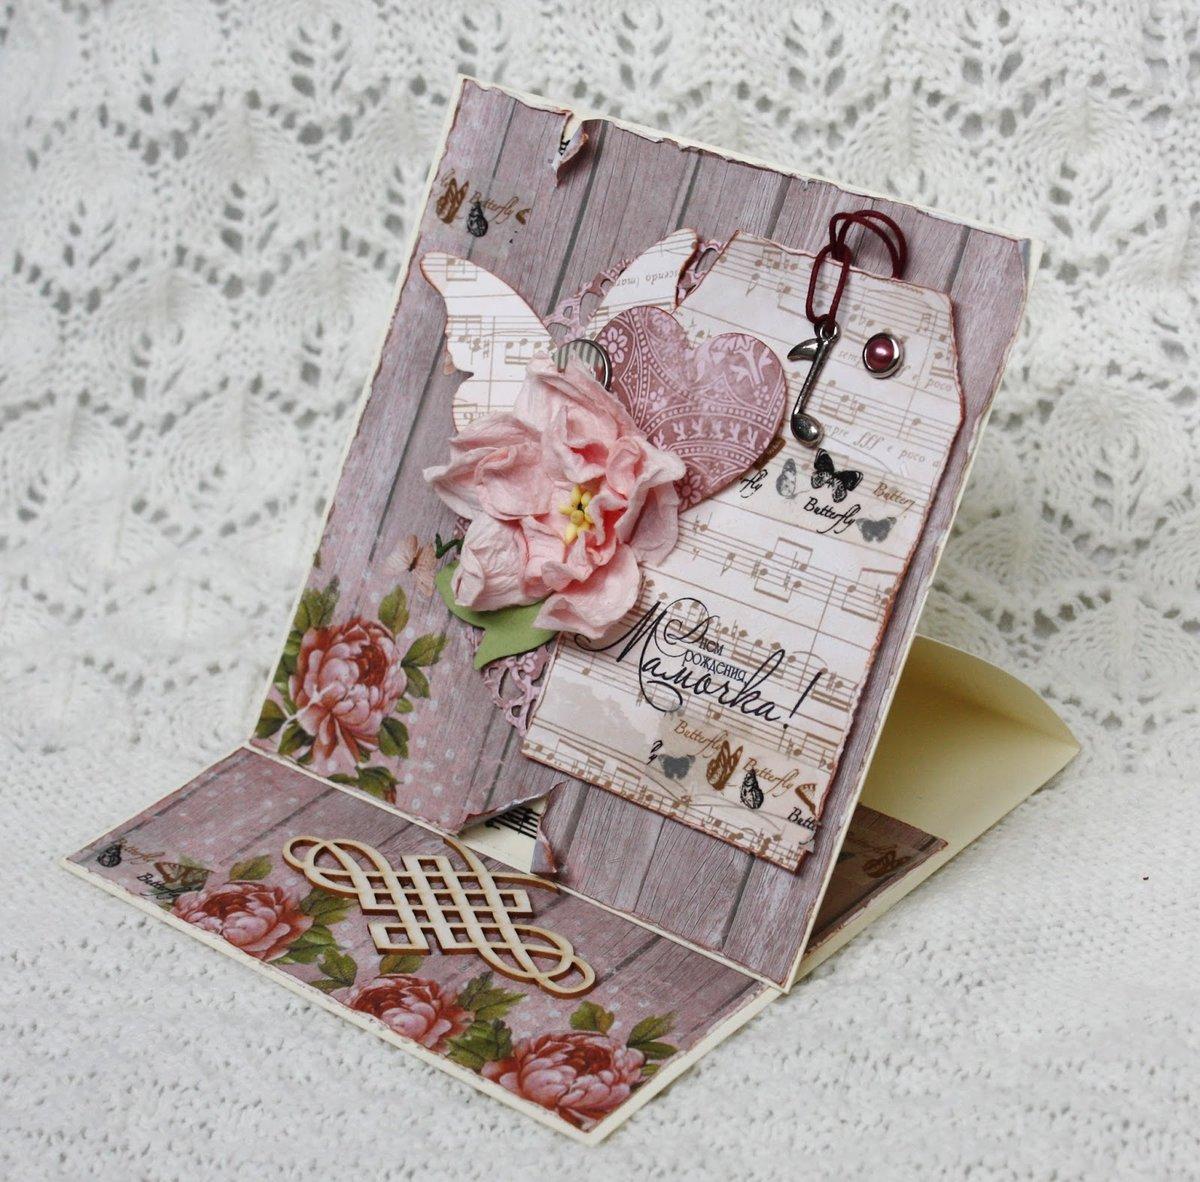 Картинки про, открытка для девушки своими руками фото